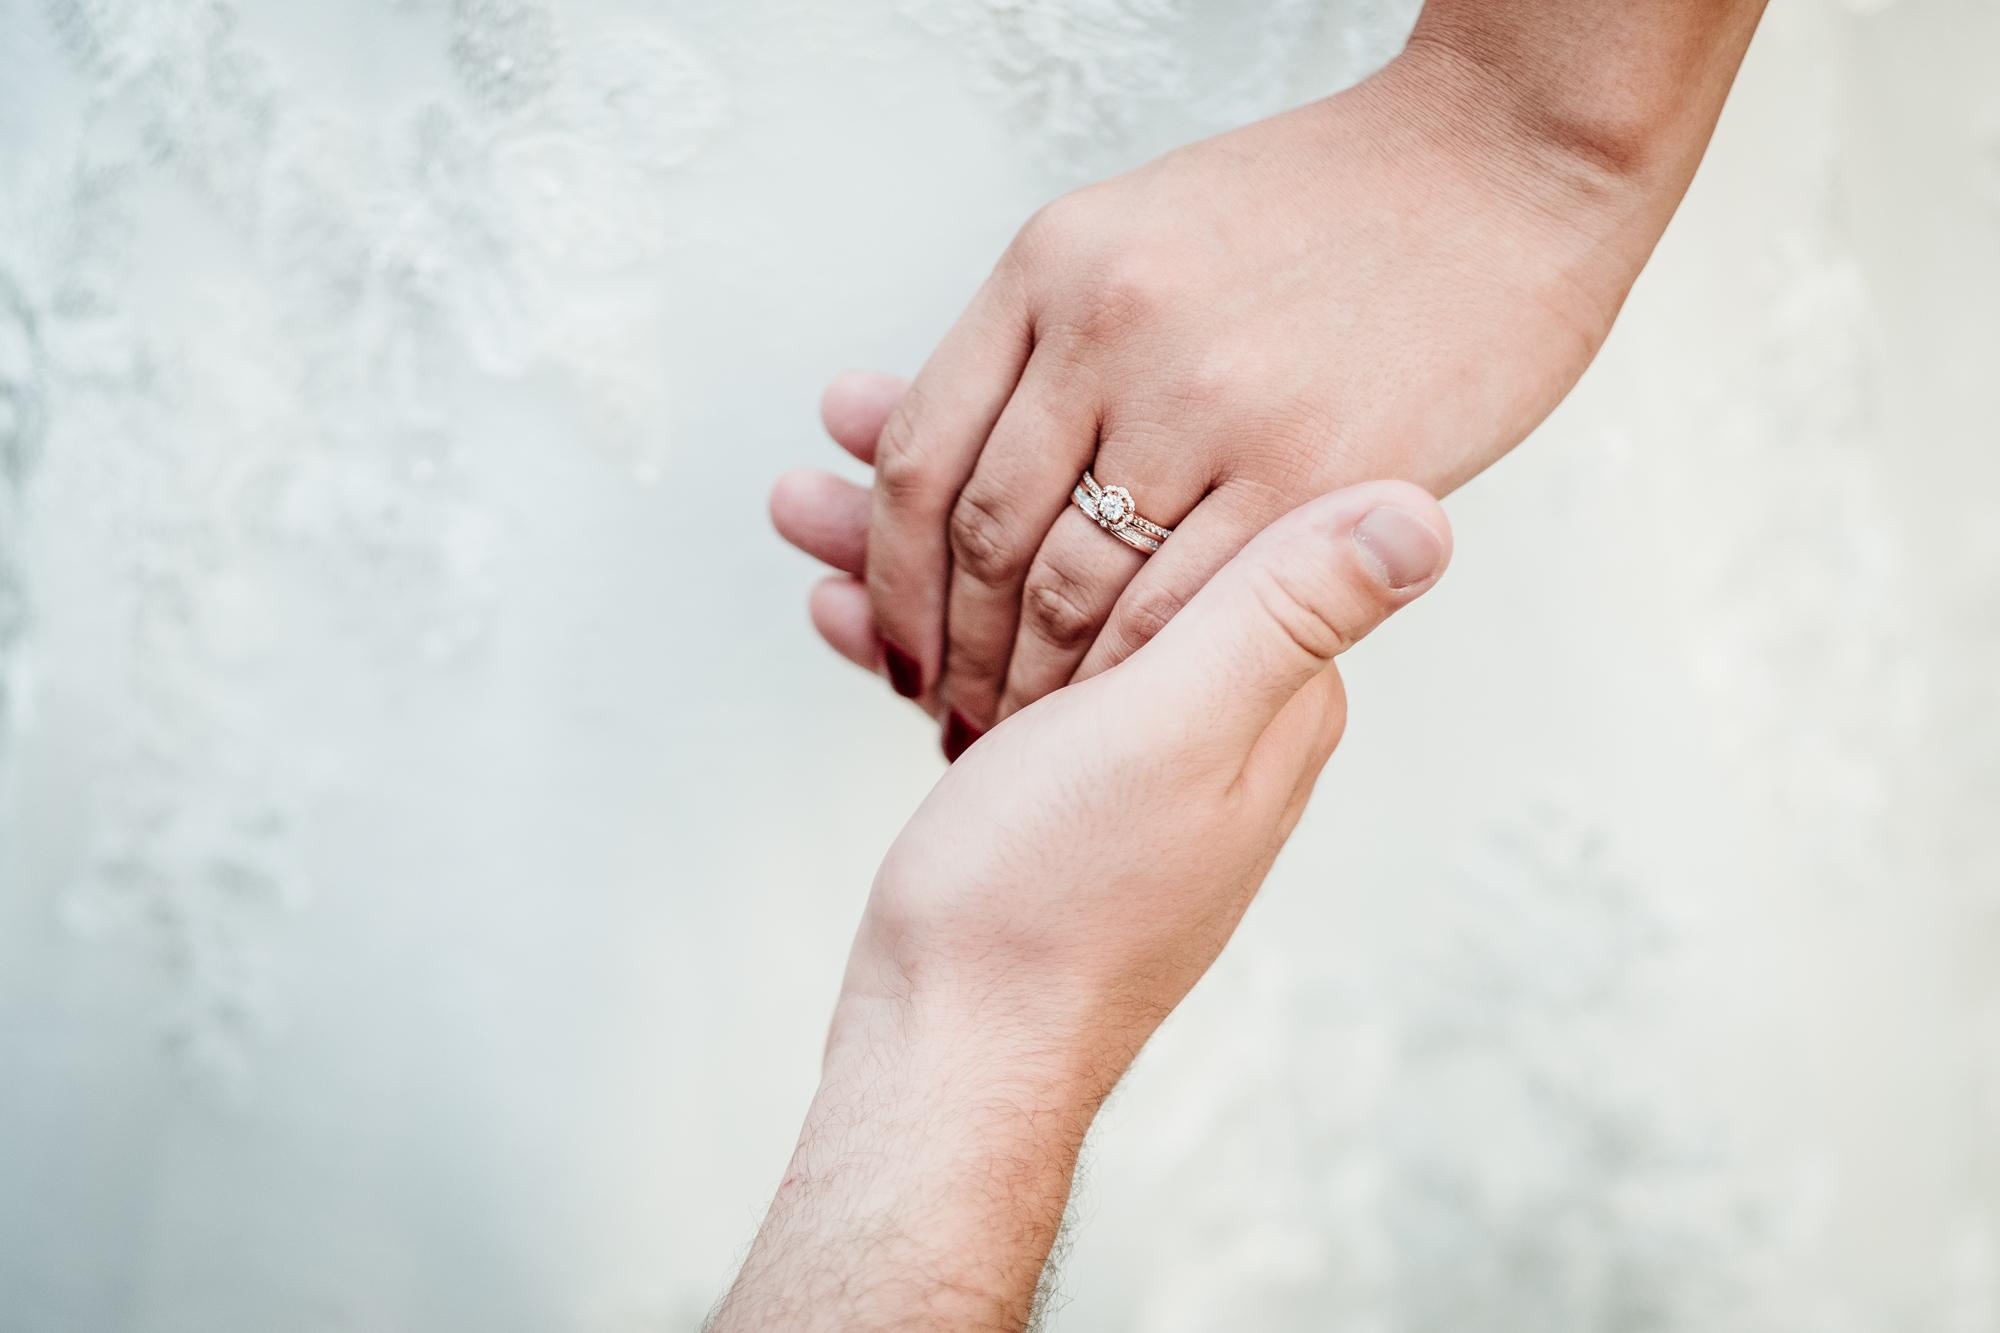 DallasAlyssa-Wedding-2019-JF-1233.jpg